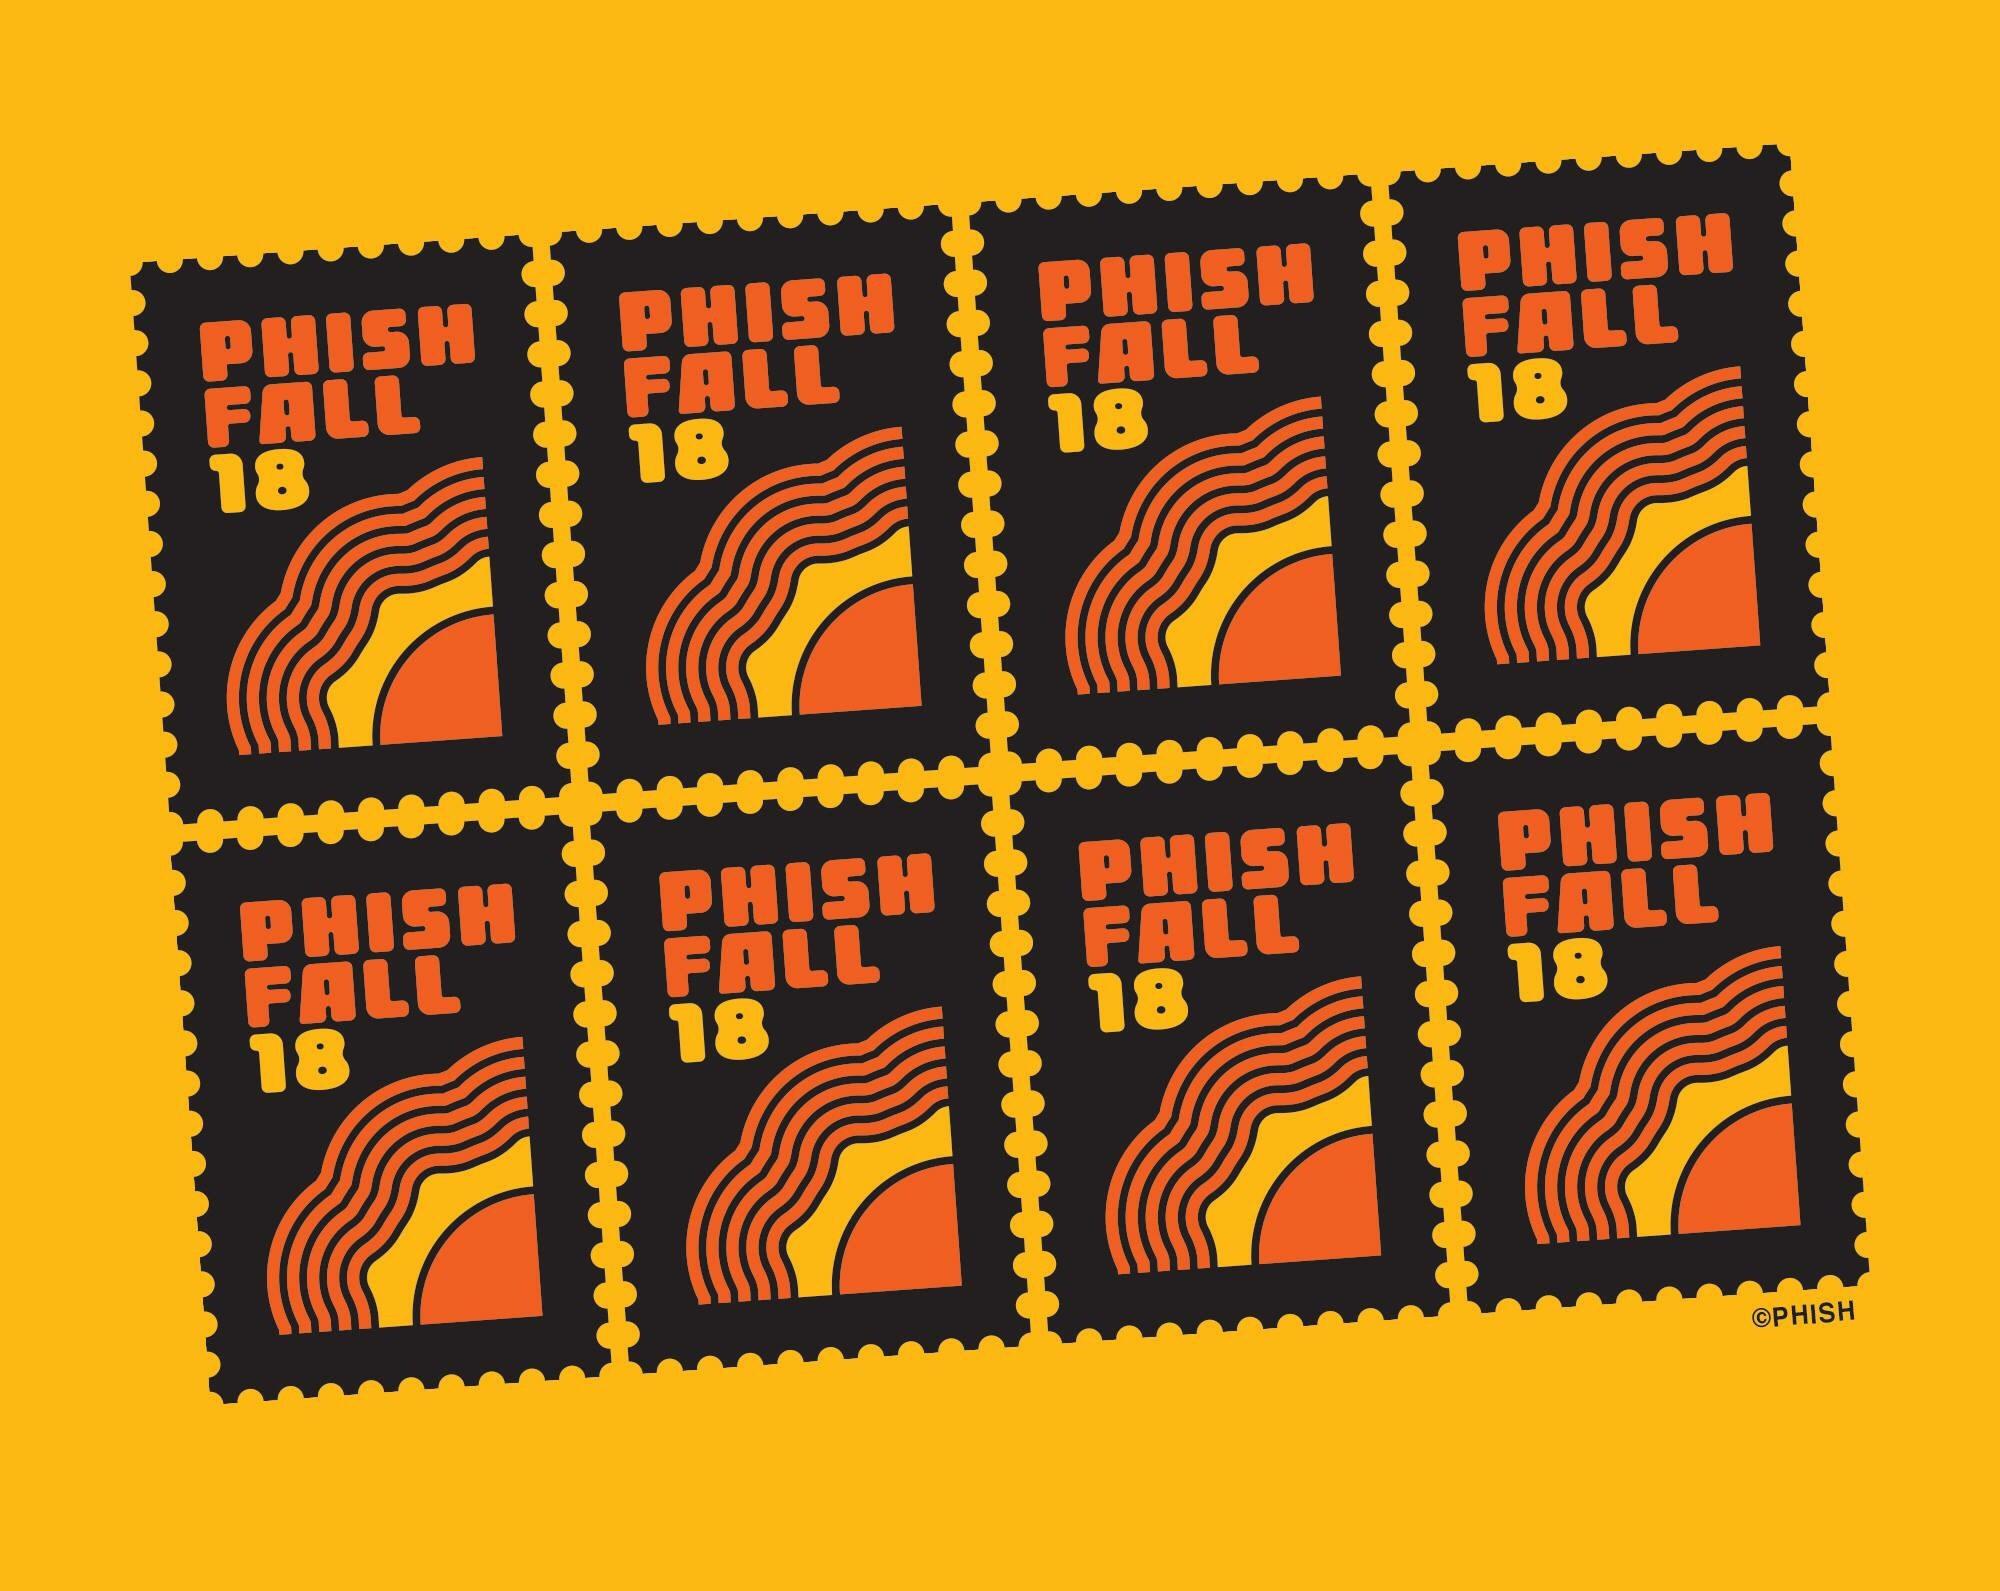 Phish Announces Fall Tour Dates!